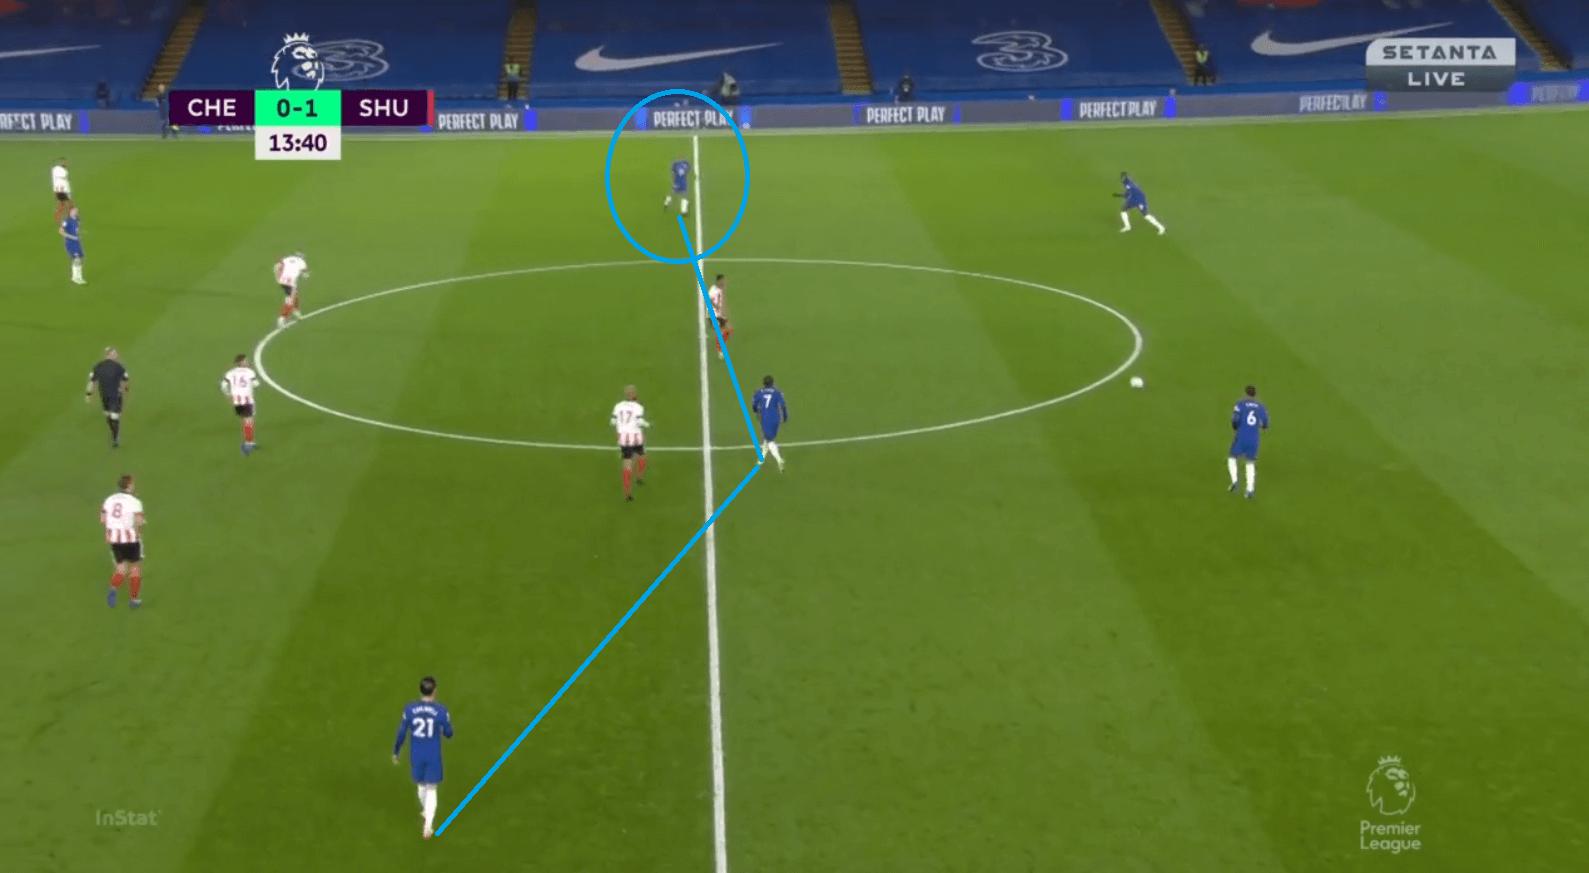 Premier League 2020/21 - Chelsea vs Sheffield United - tactical analysis - tactics